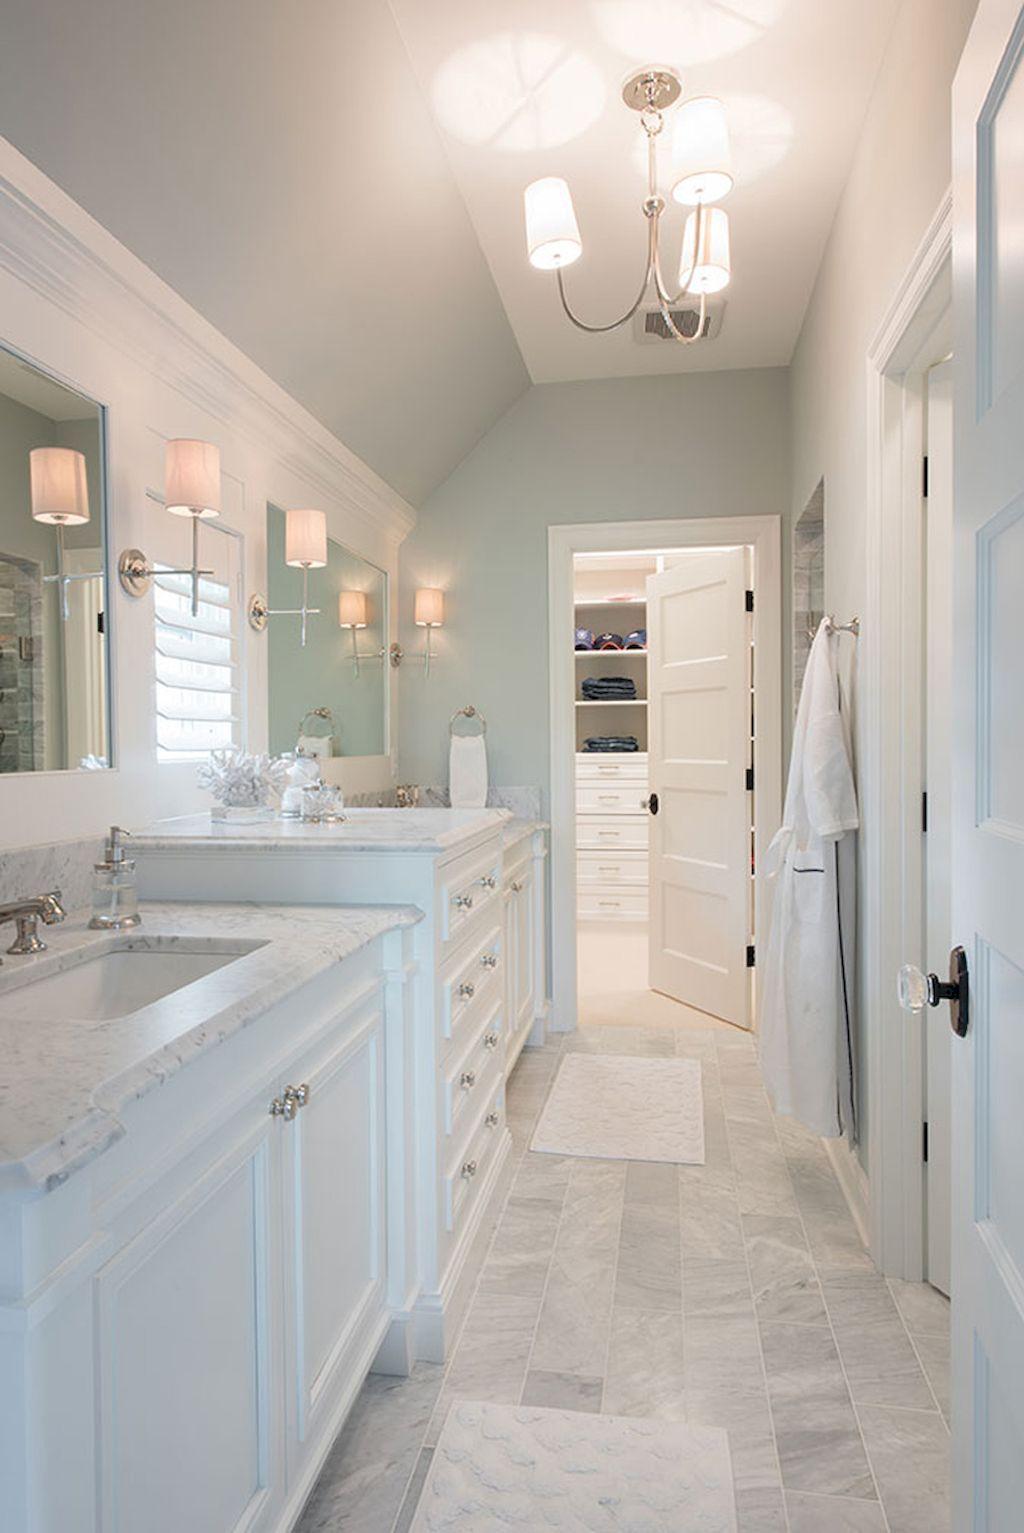 80 Beautiful Master Bathroom Remodel Ideas | Master bathroom remodel ...